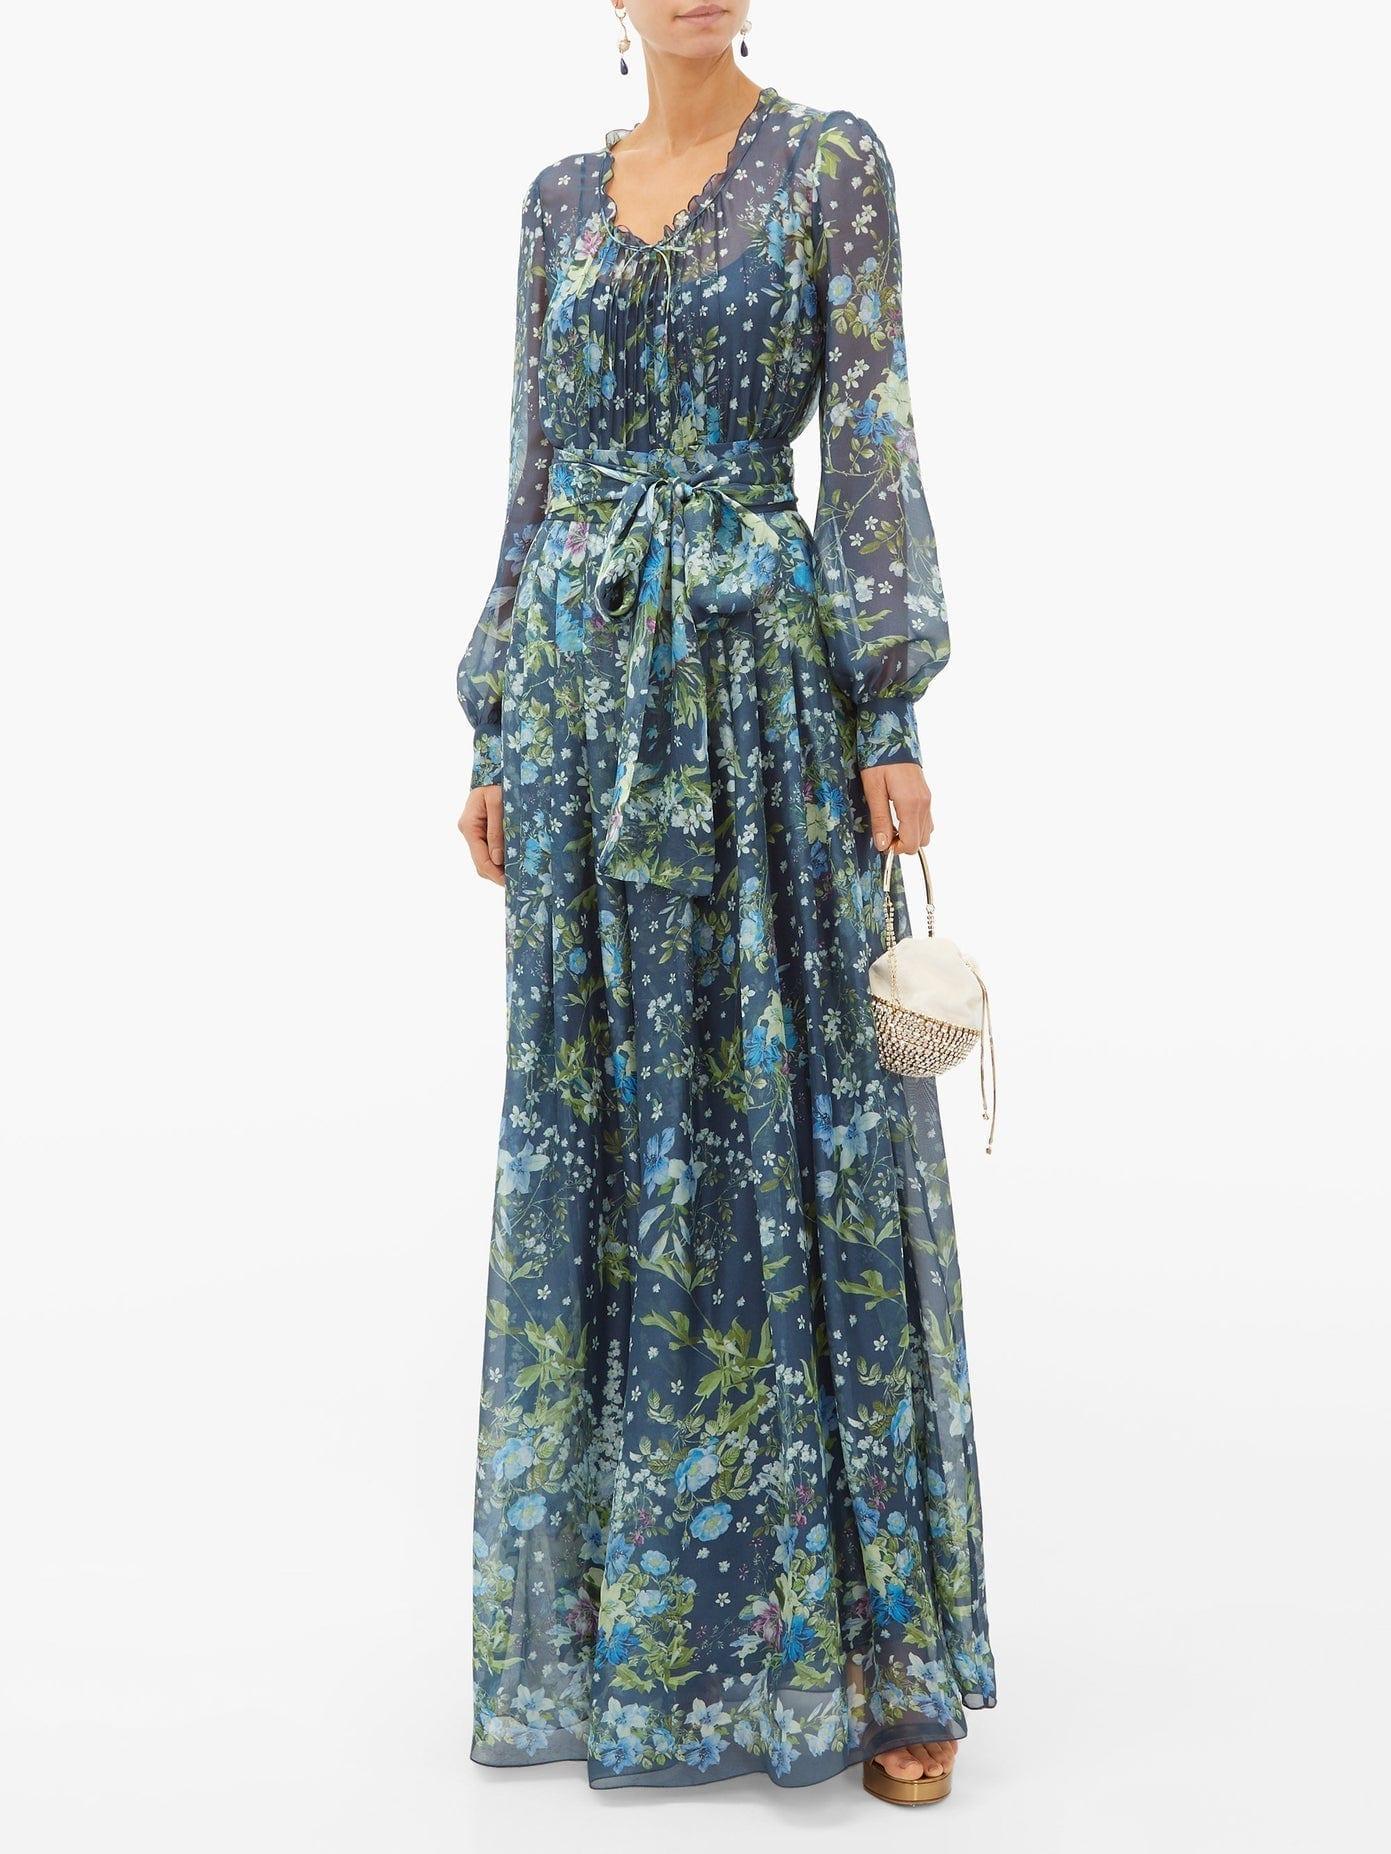 LUISA BECCARIA Waist-Tie Floral-Print Silk-Organdy Gown